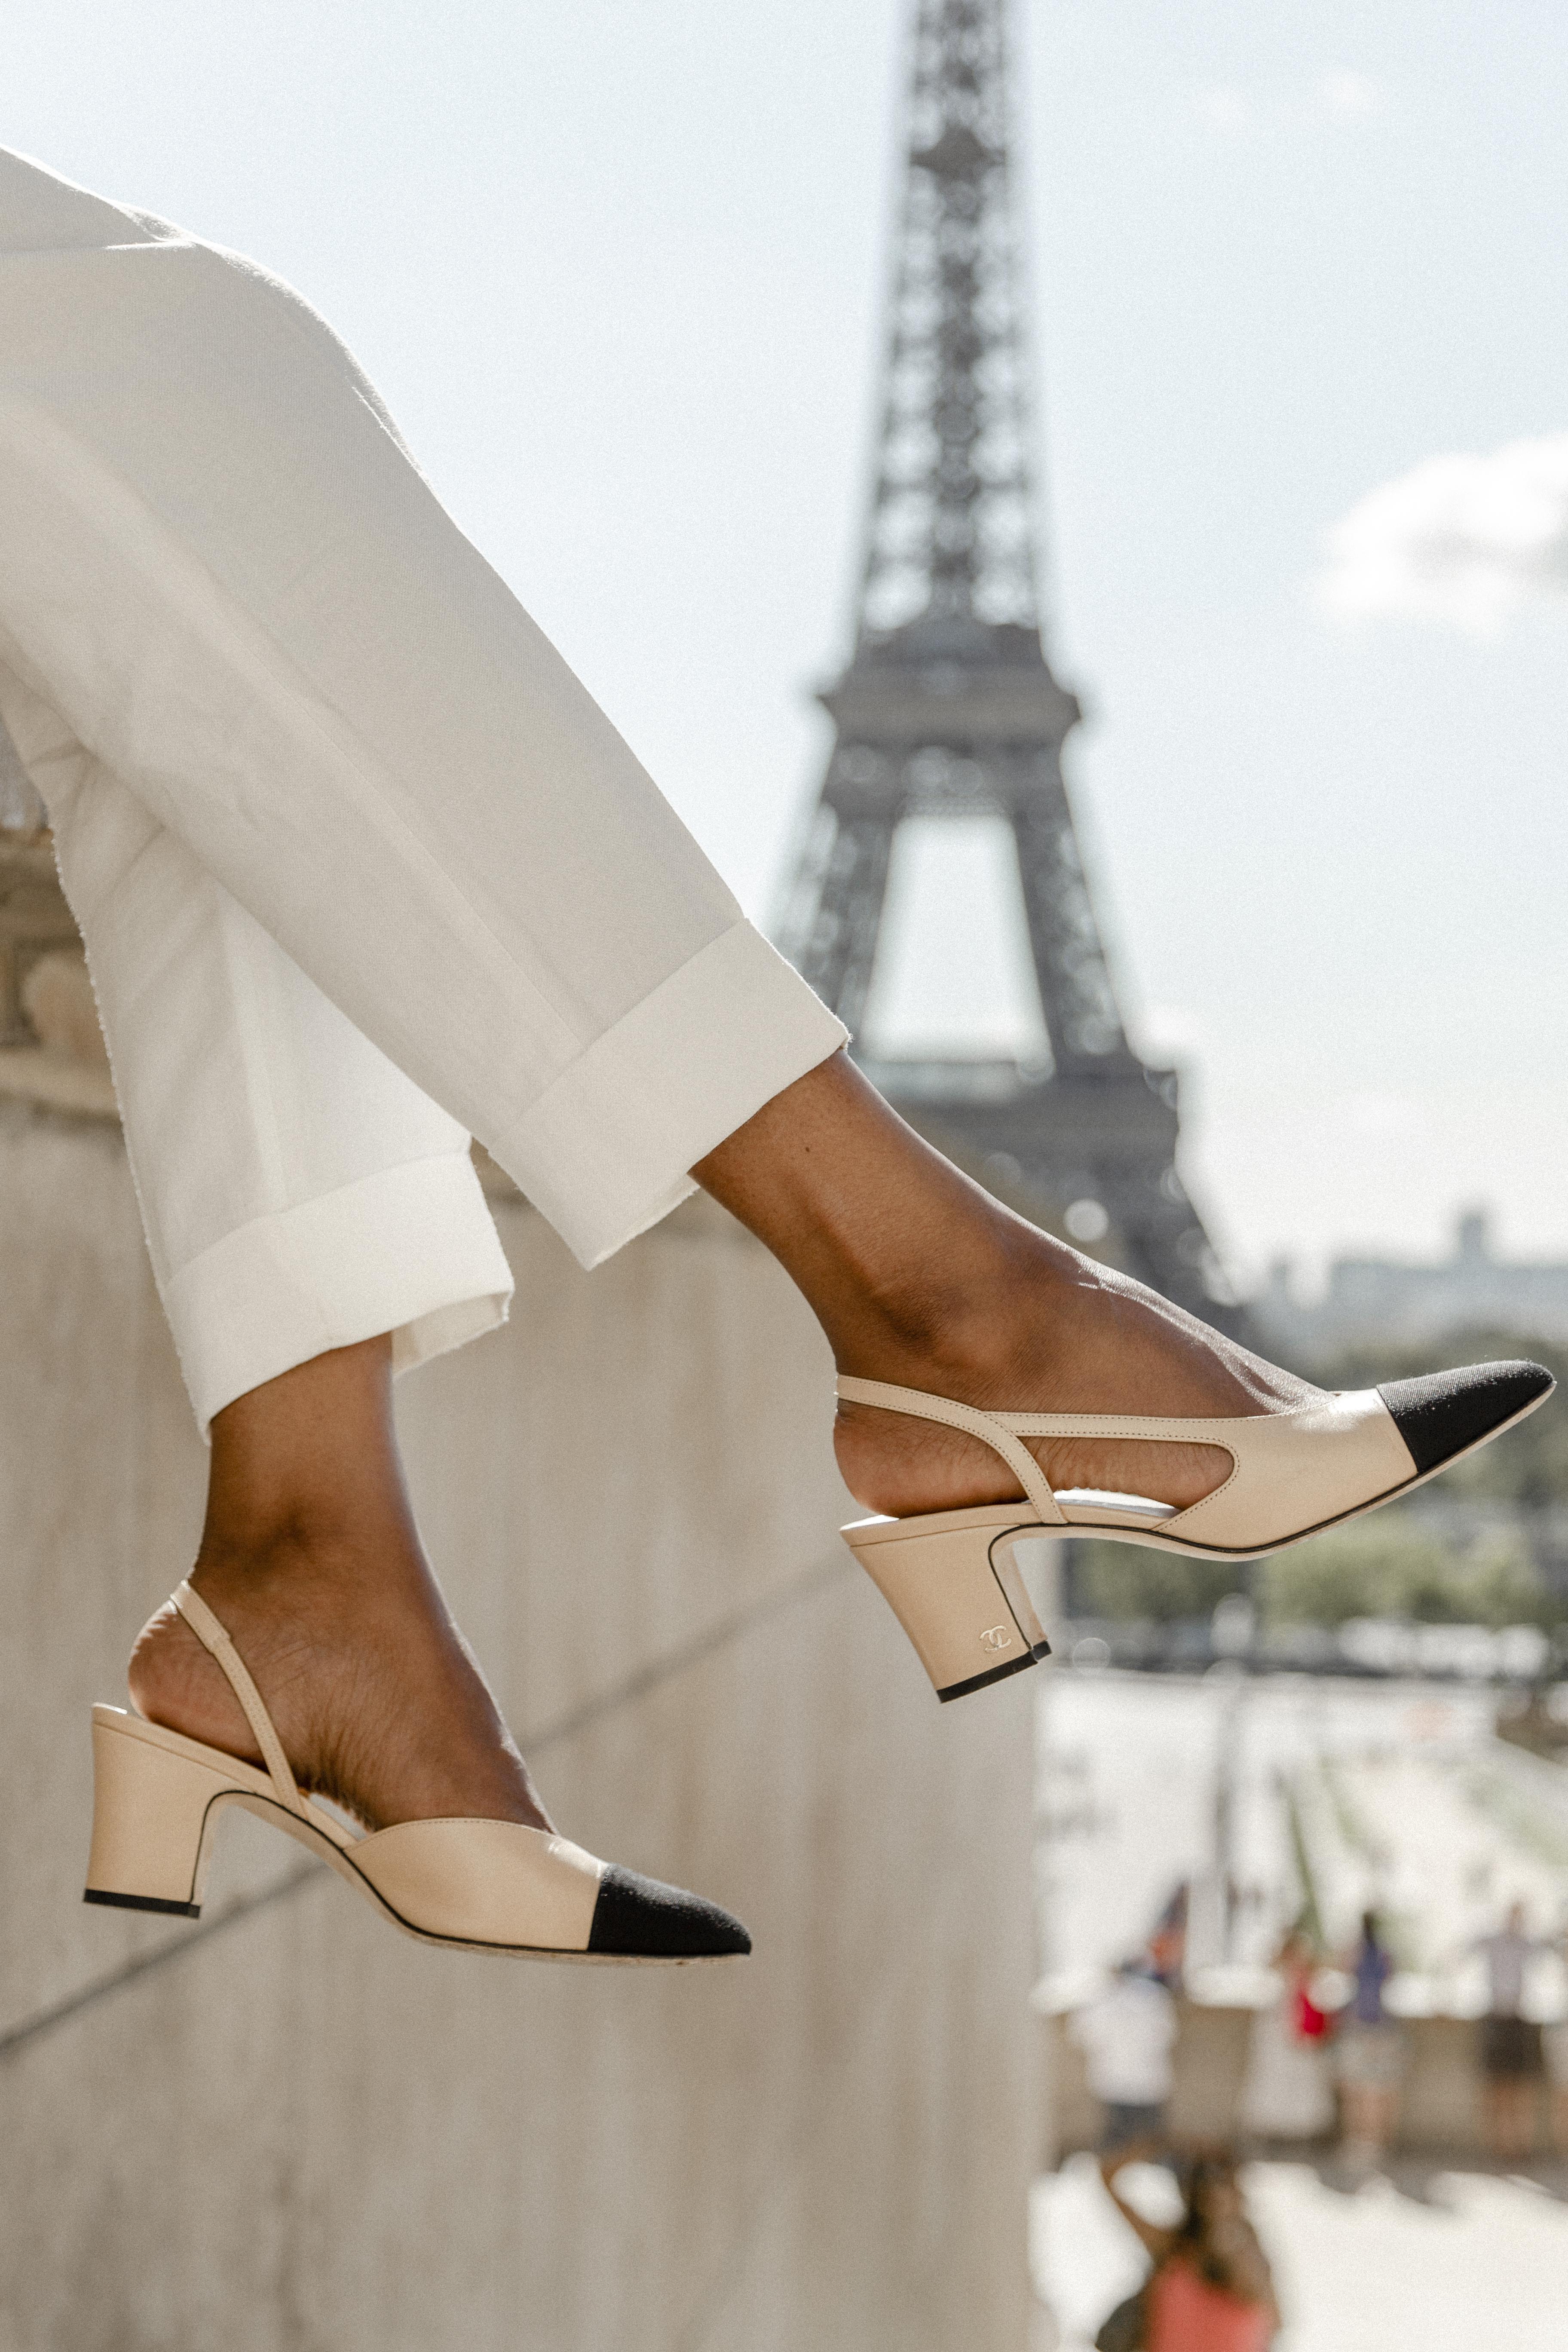 Short trip to Paris